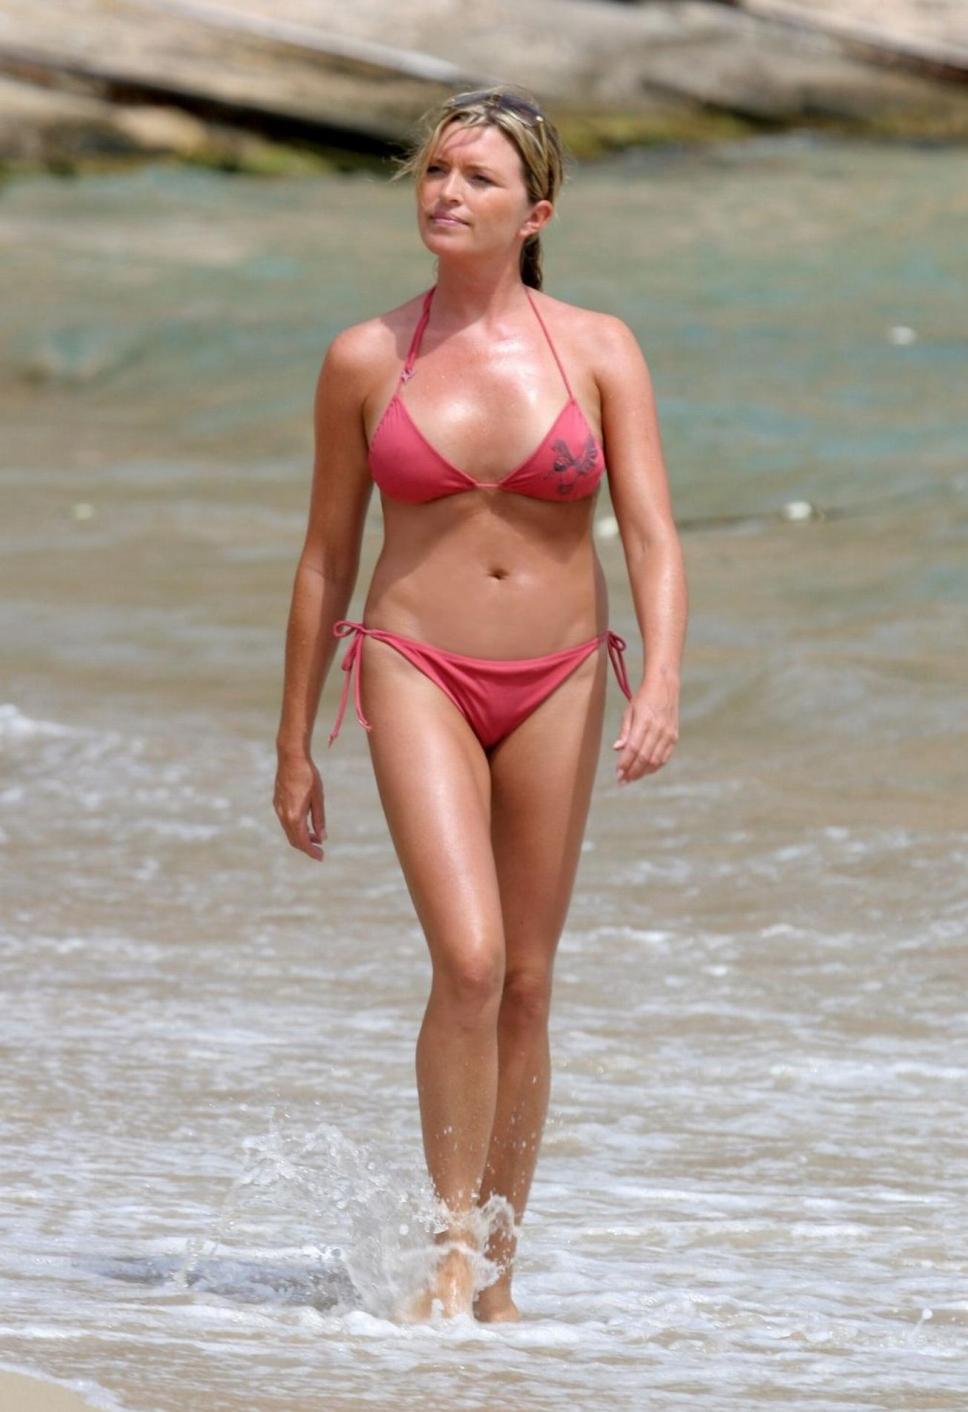 Tina Hobley in a bikini